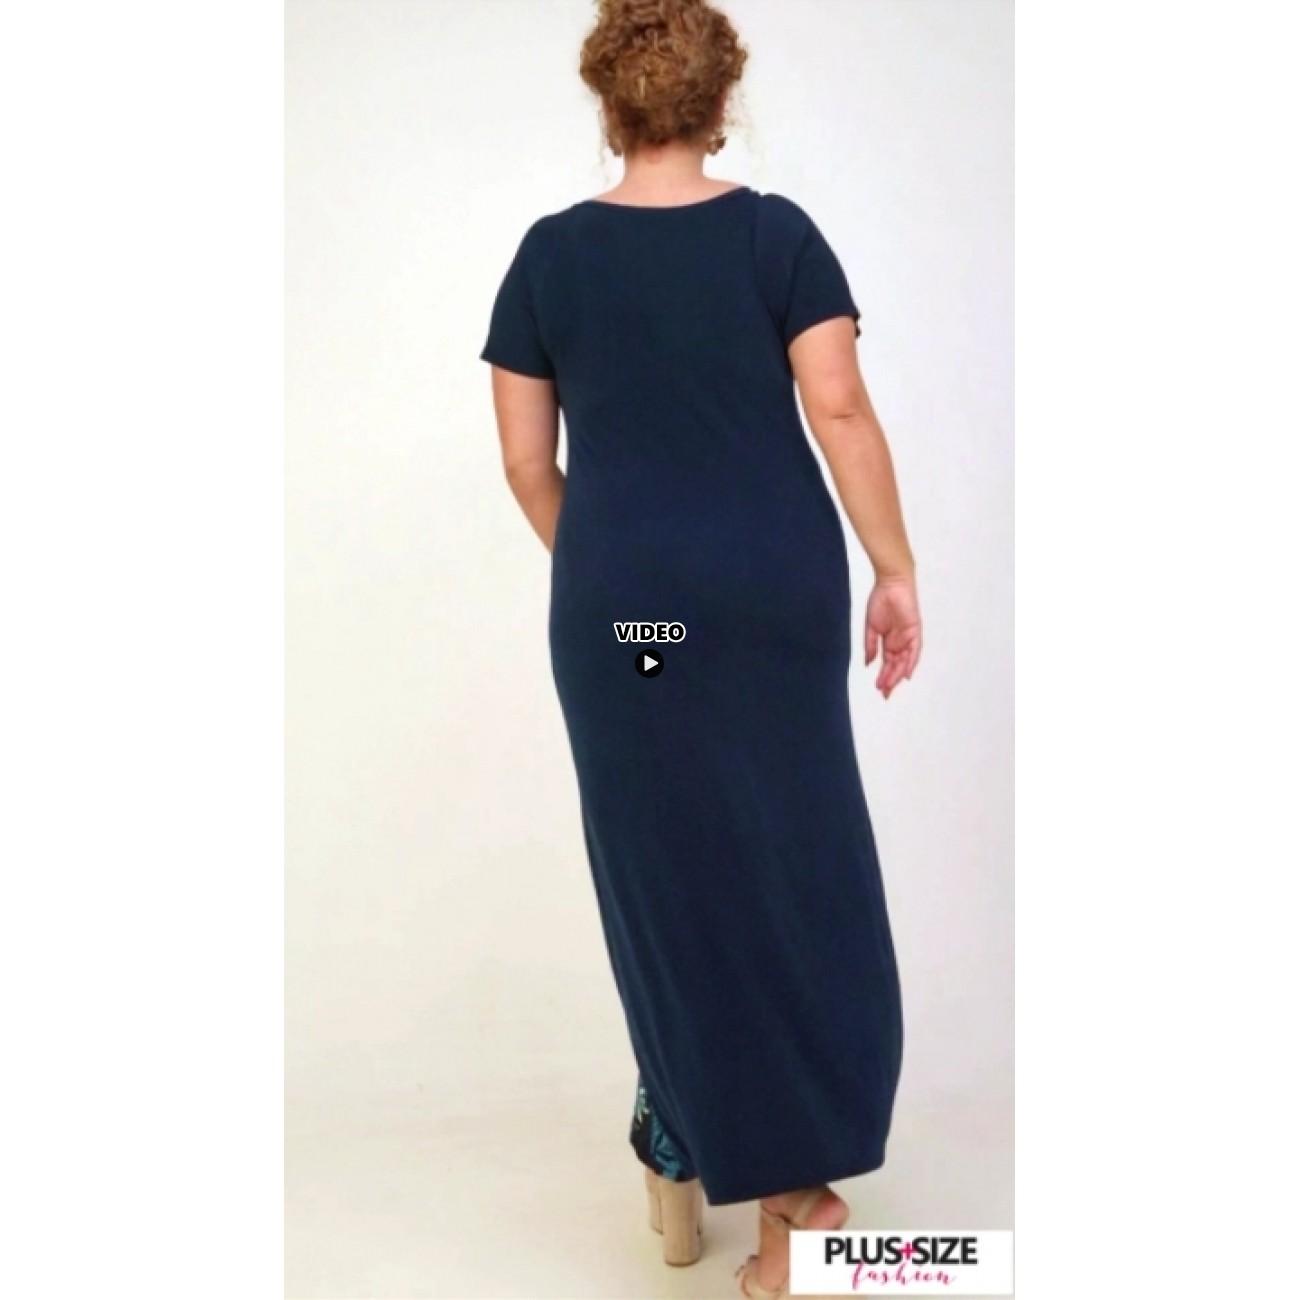 A21-4823FK Long Jersey Dress with pattern